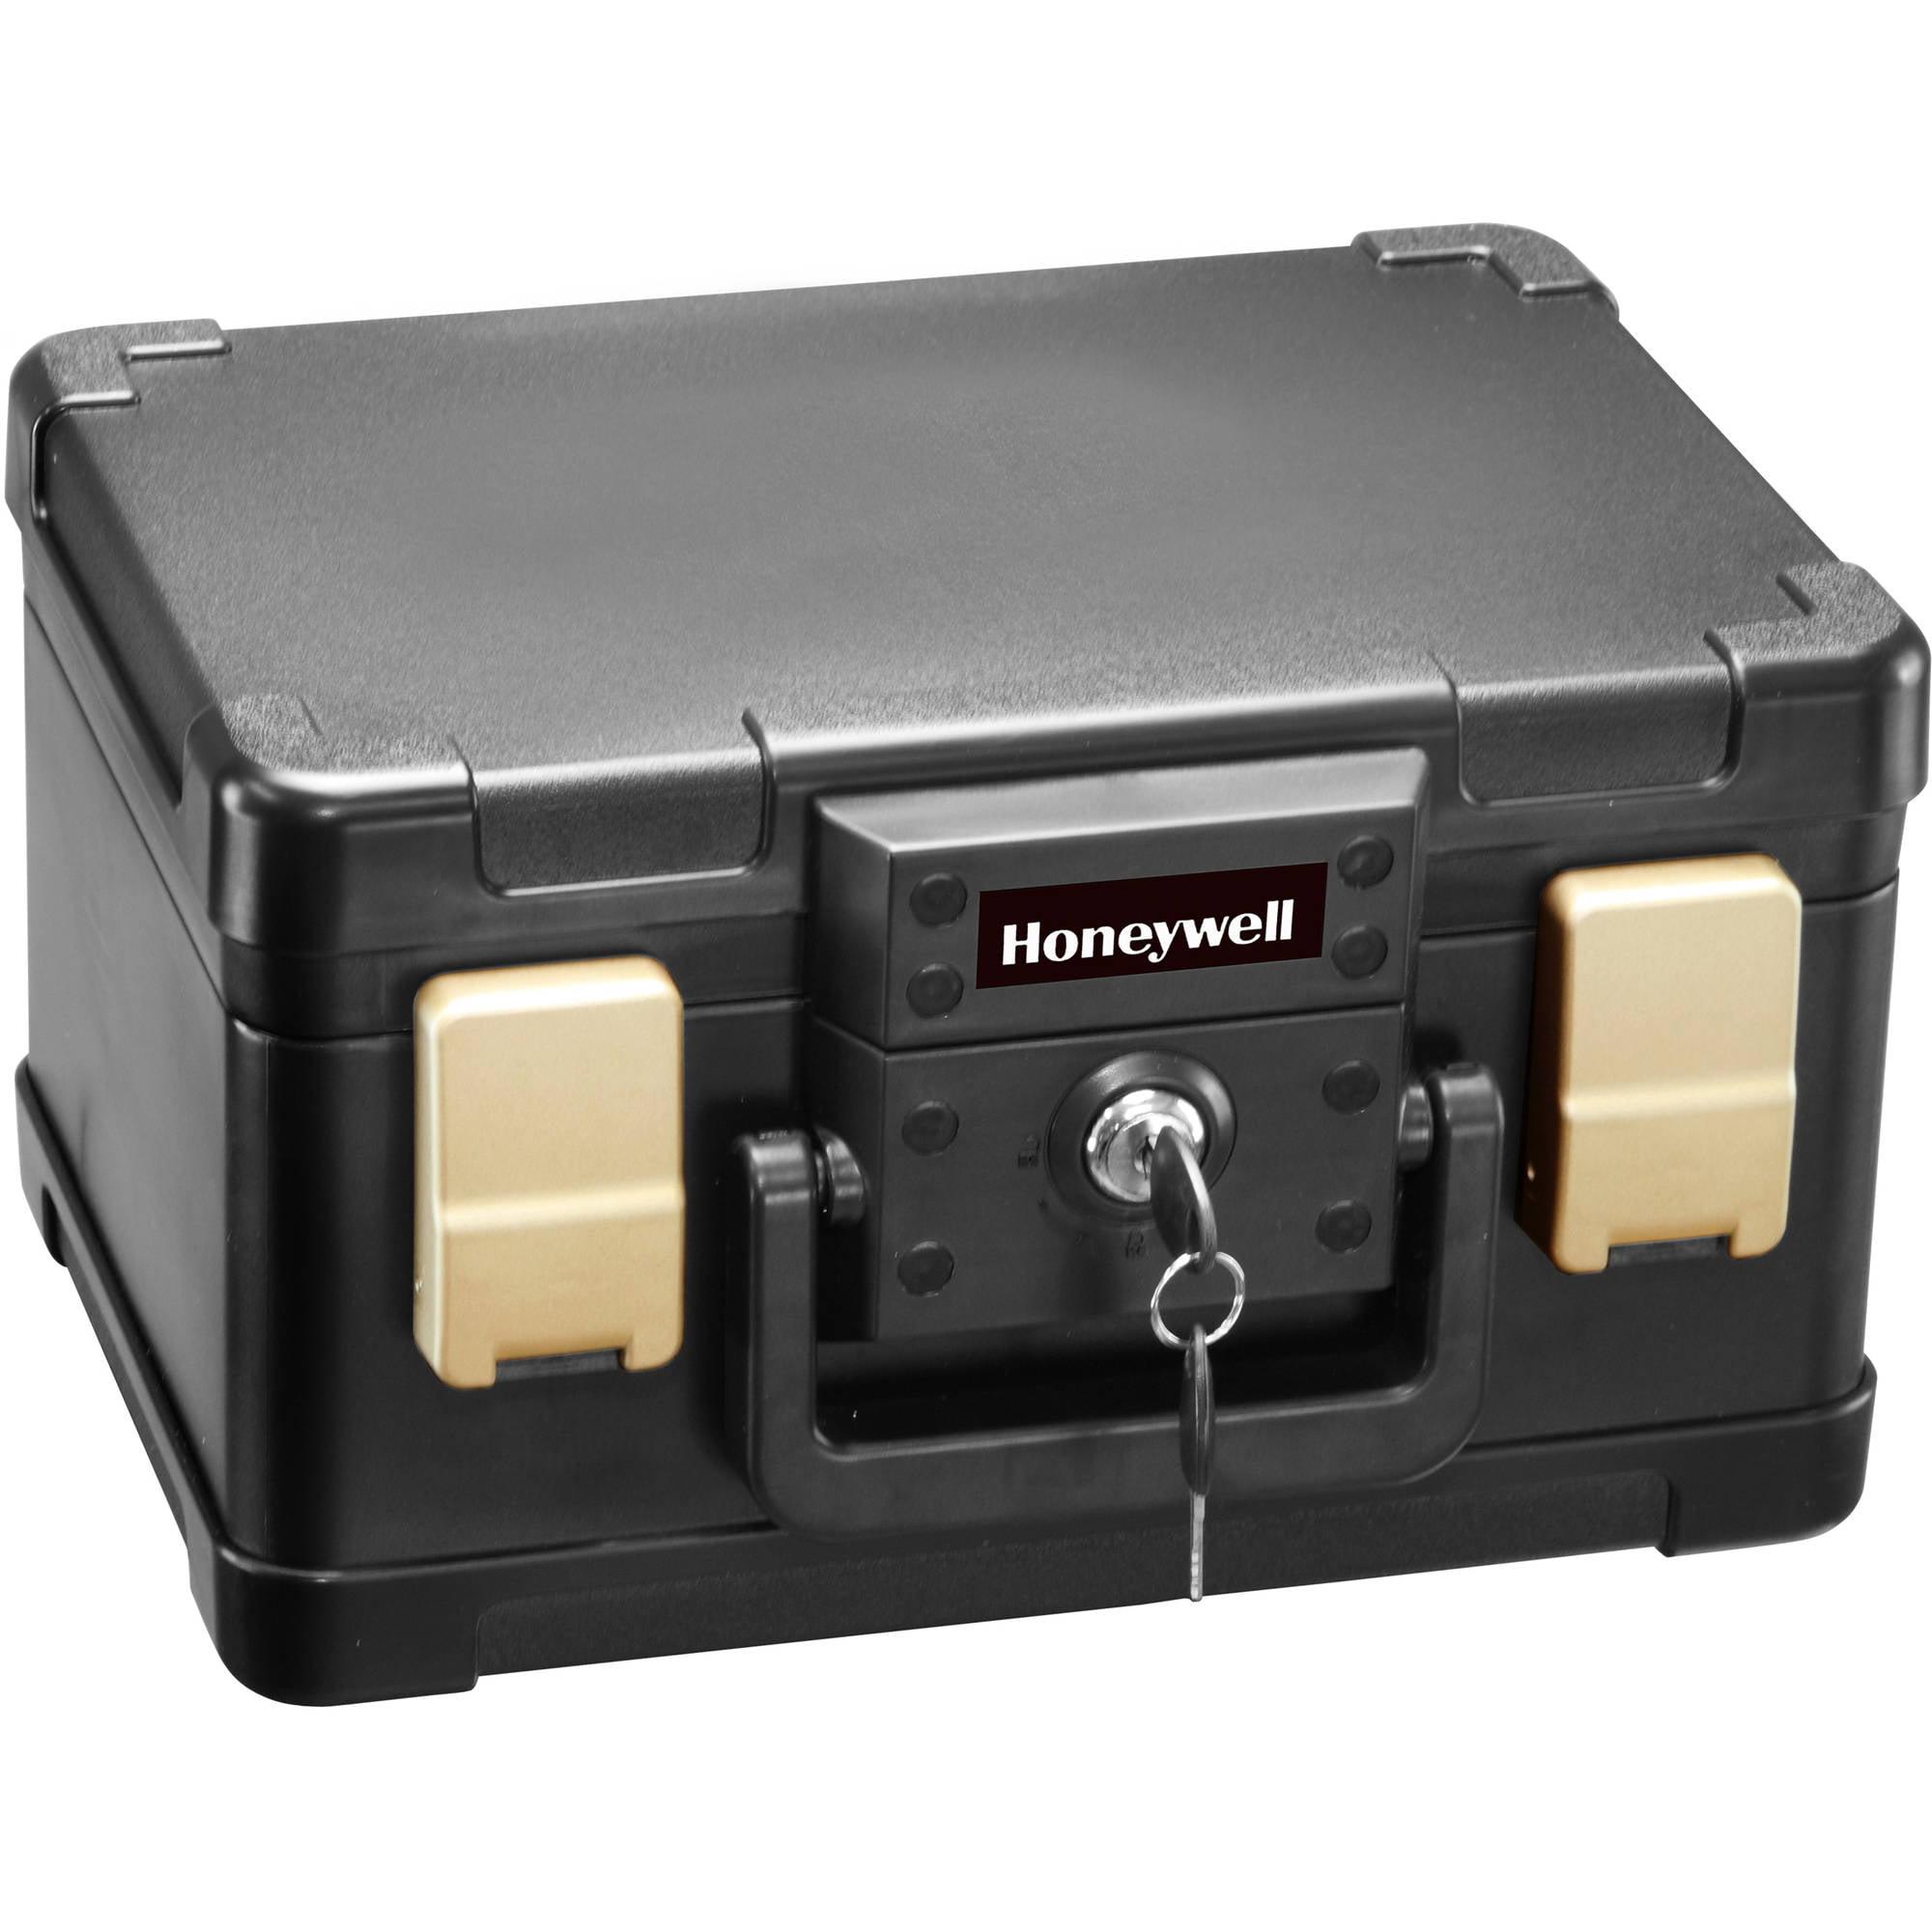 Honeywell .15 cu ft Waterproof 30-Minute Fire Chest, 1102